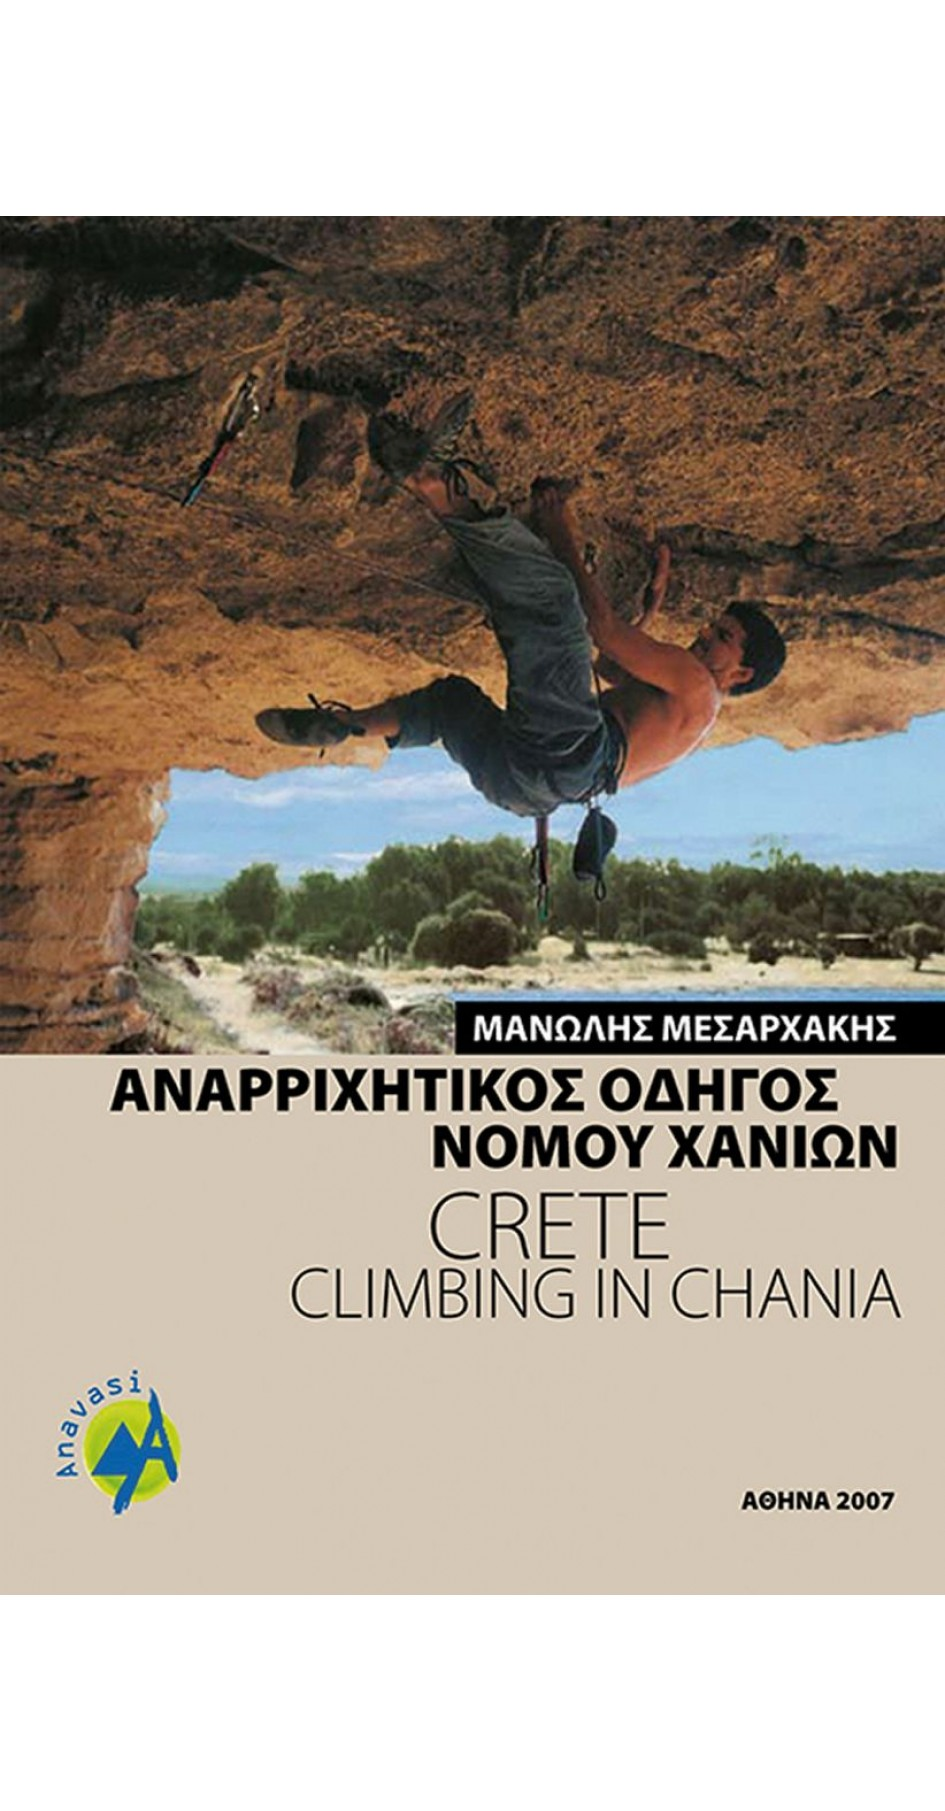 Climbing in Chania (Crete)